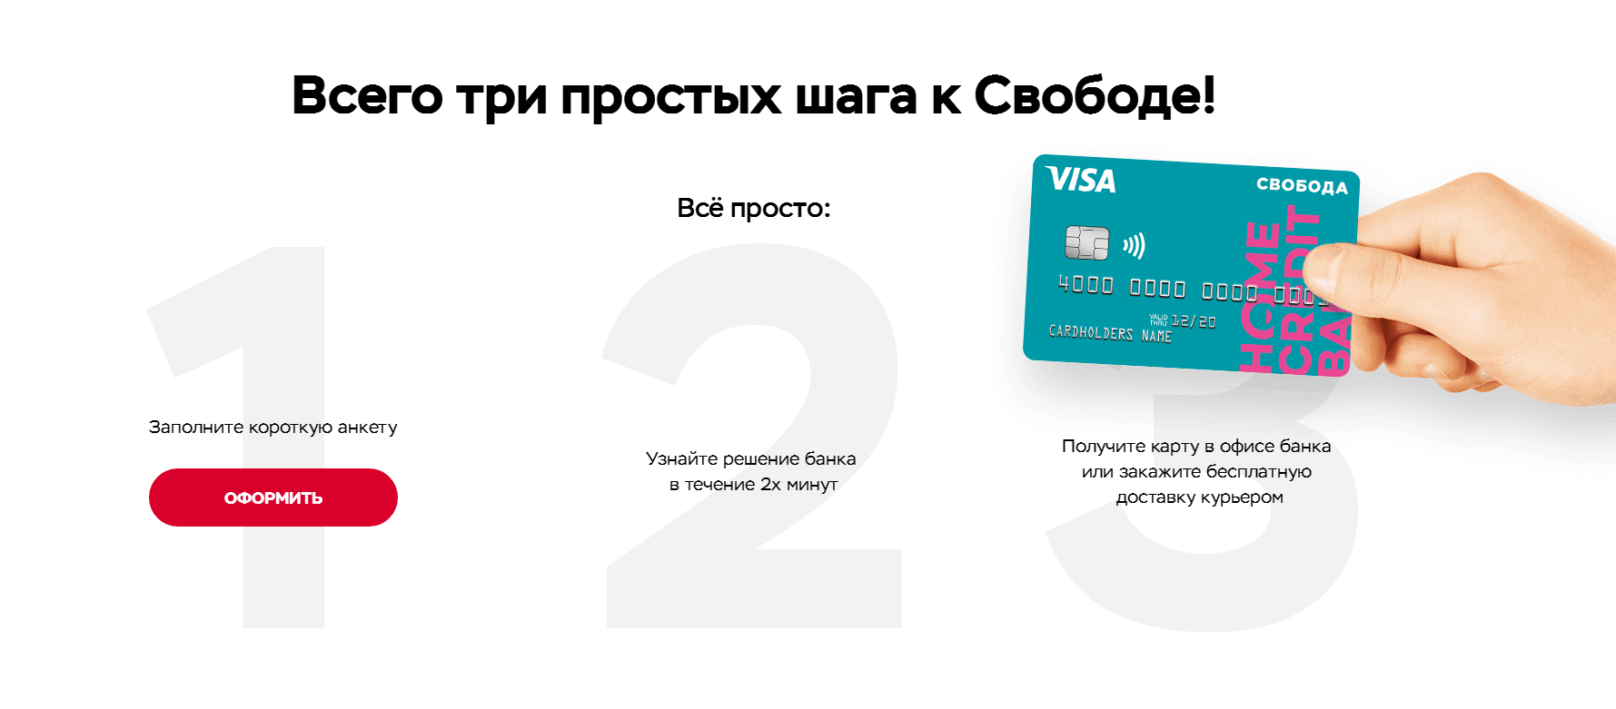 Хоум Кредит Свобода - карта рассрочки на все покупки